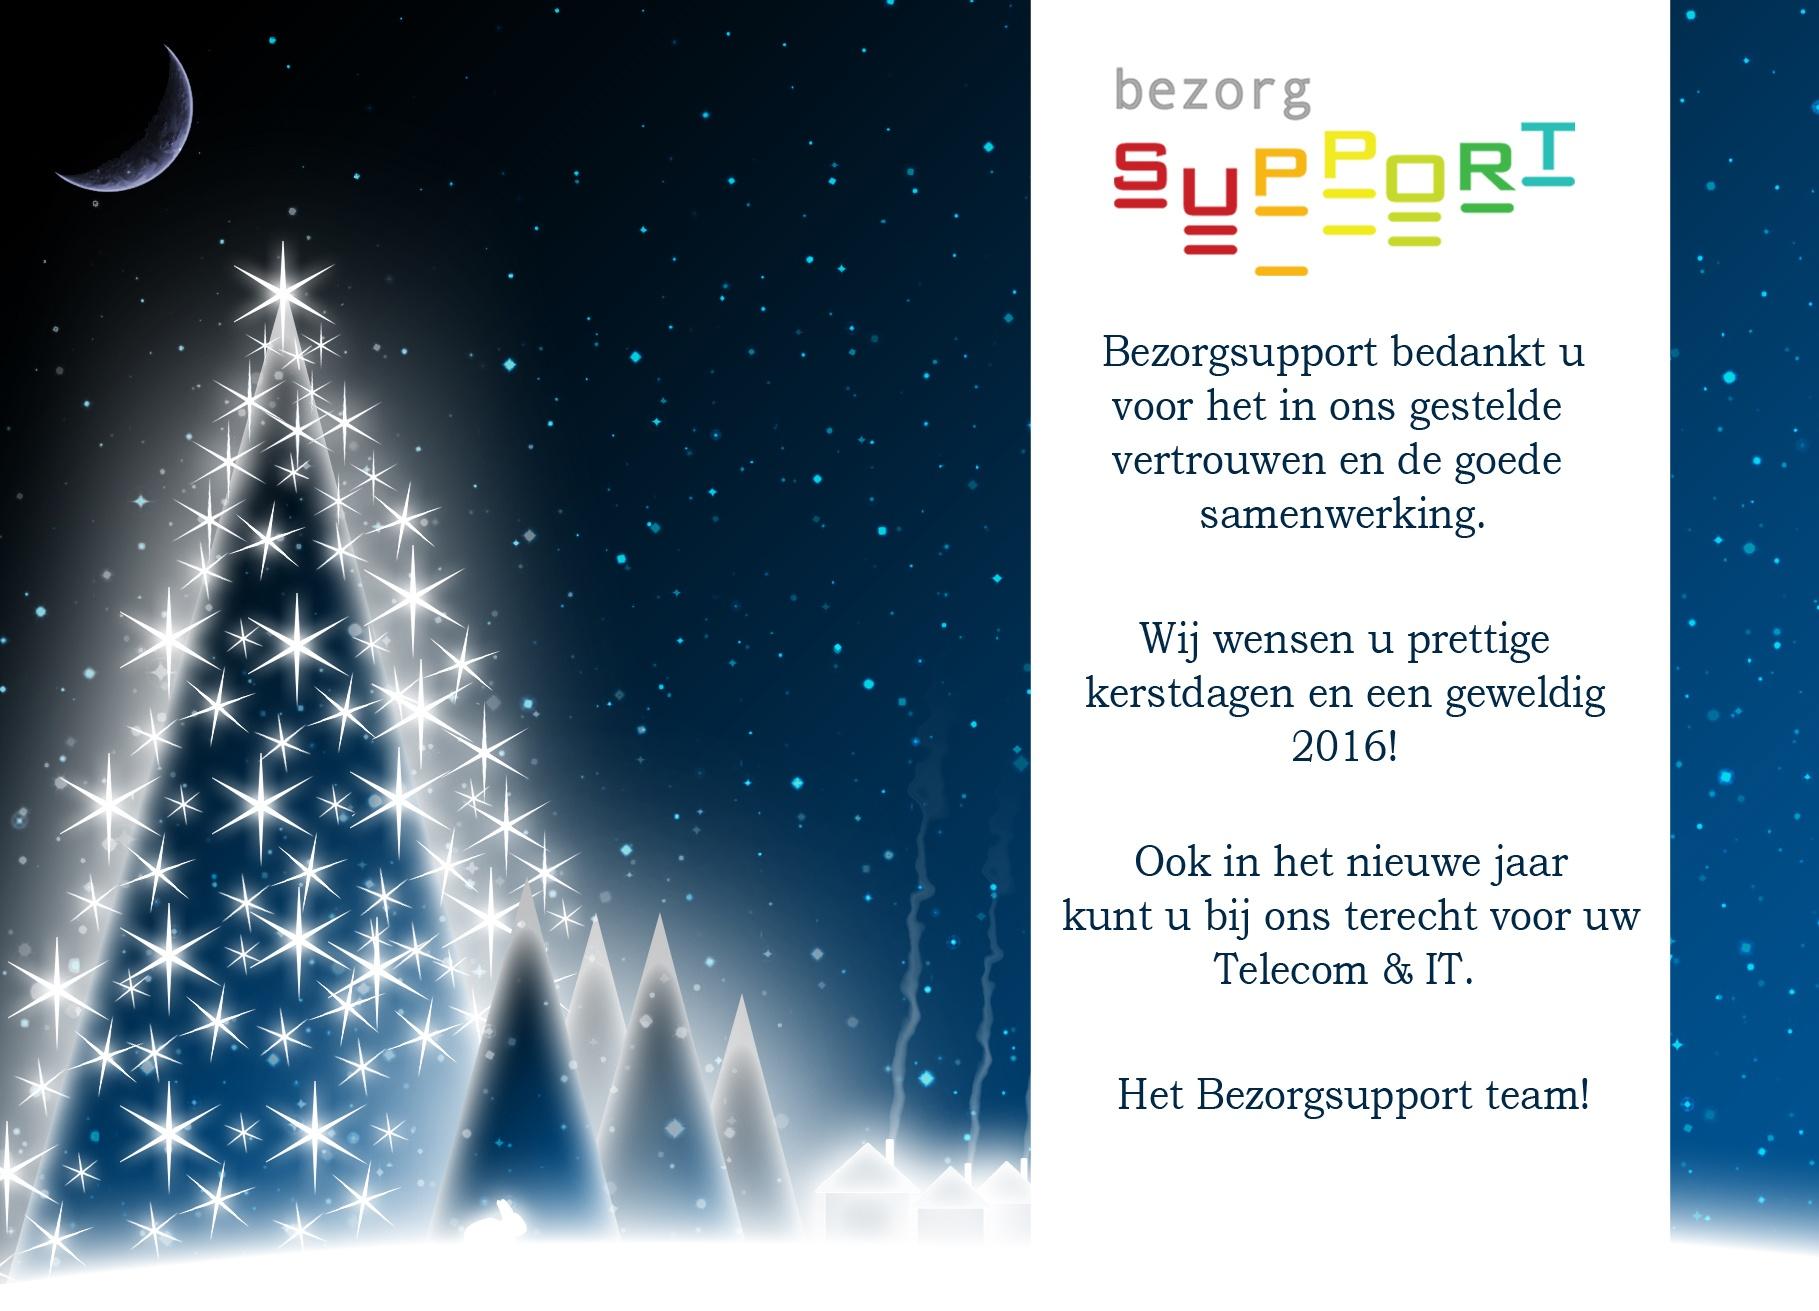 Bezorgsupport - Fijne Feestdagen! 2015